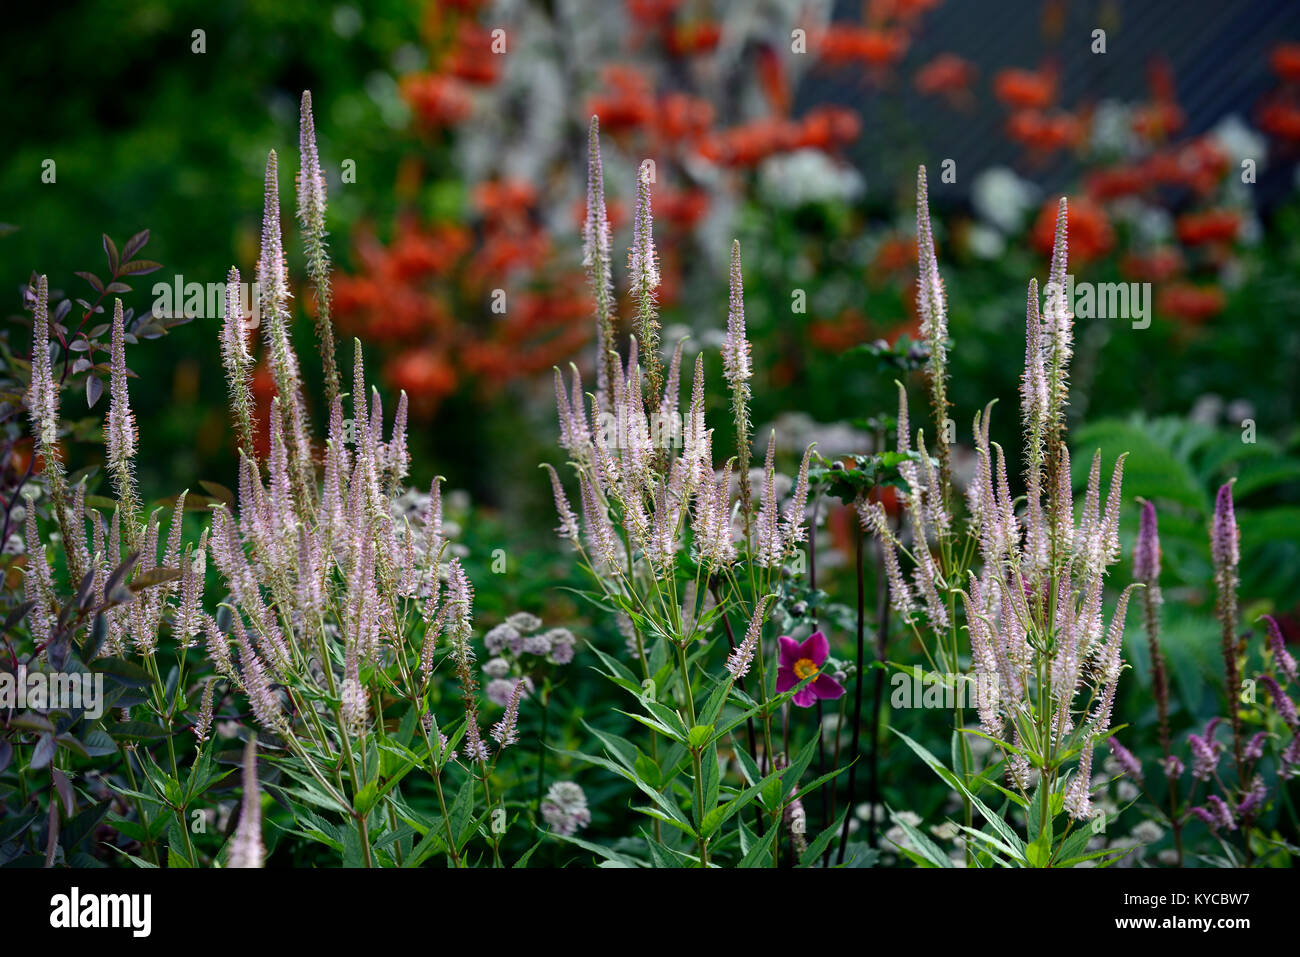 veronicastrum virginicum,pink,lilac,flower,flowers,spire,spires,spike,spikes,garden,gardens,RM Floral - Stock Image